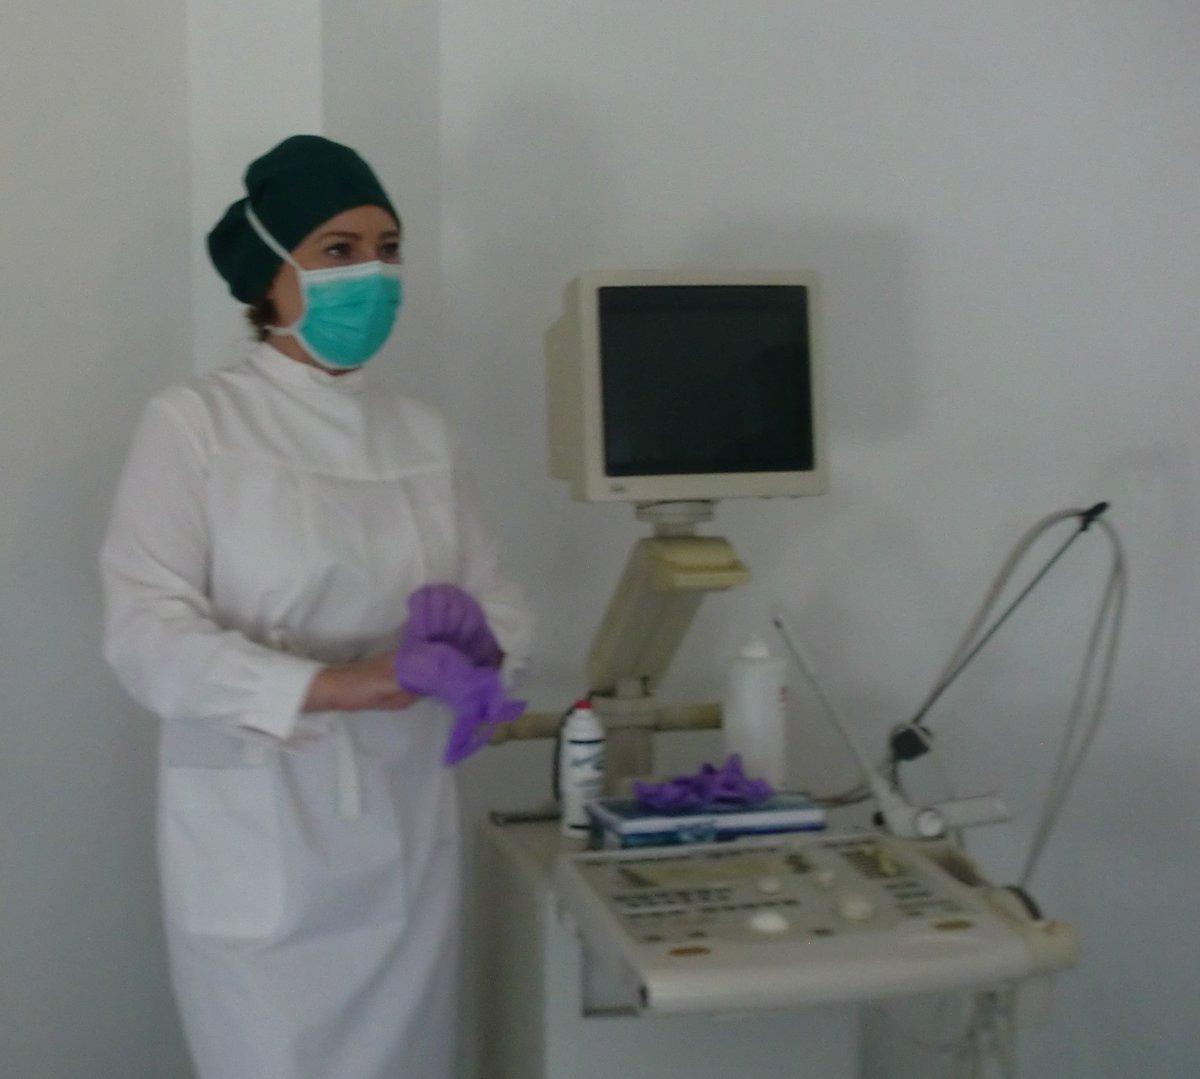 #roleplayclinic #MedFet #vintageDoctorCoat #UltrasoundPlay #DoctorJill  #FetishDoctor #MedicalMistress #gloveFetish